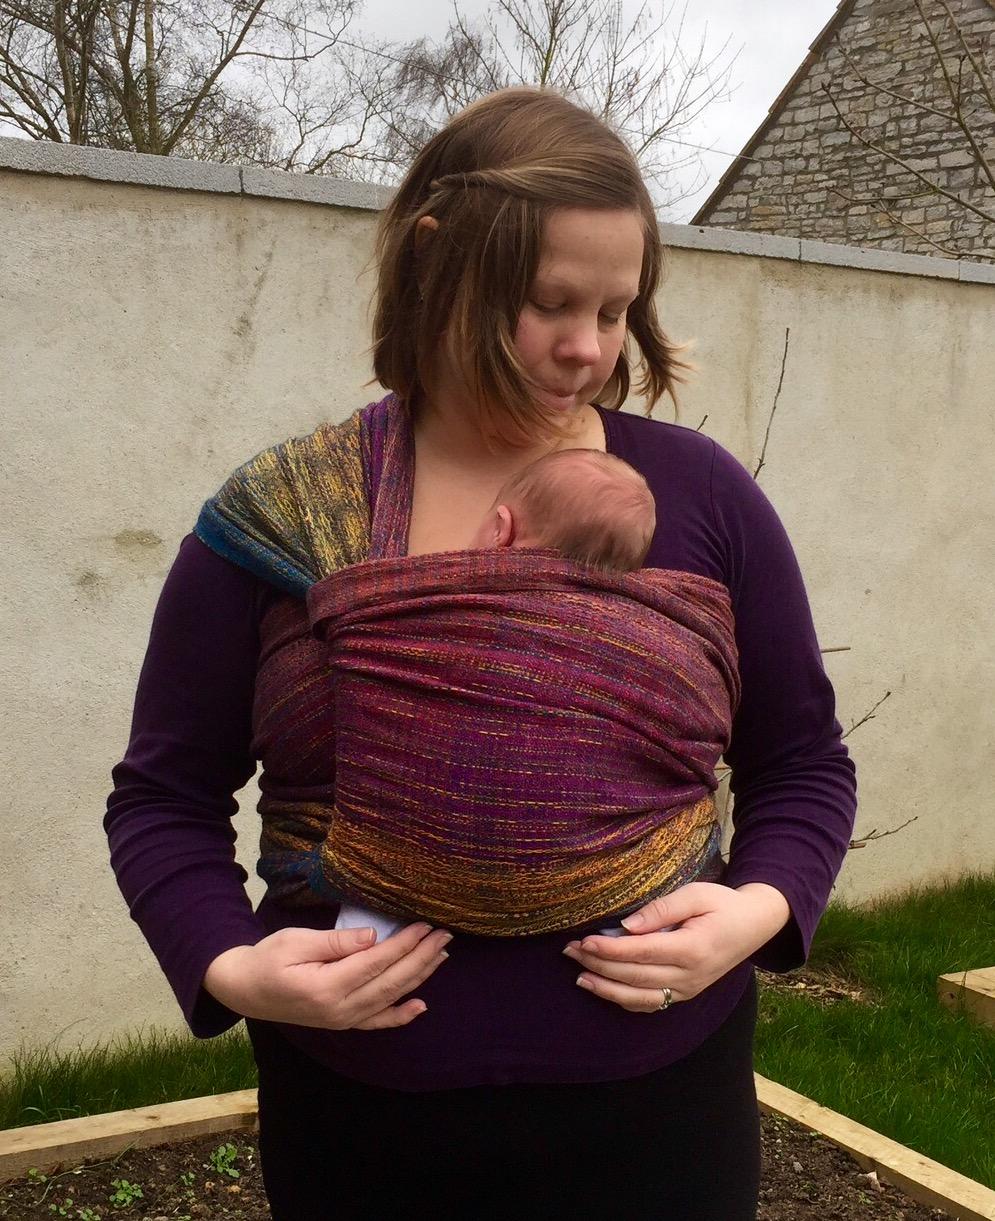 Little Fellows 'After Autumn Must Come...' LF313 Handwoven Carrying a Newborn